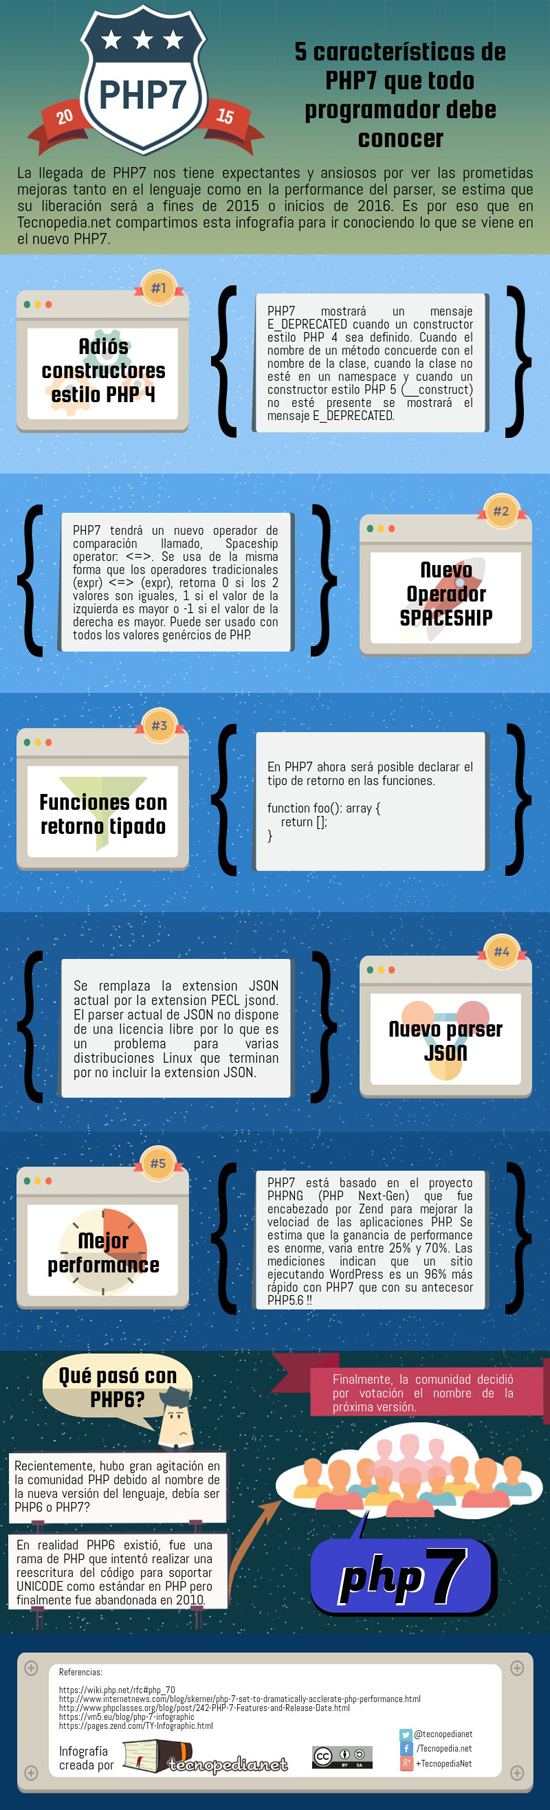 infografia-novedades-php-7-tecnopedia-acens-blog-cloud